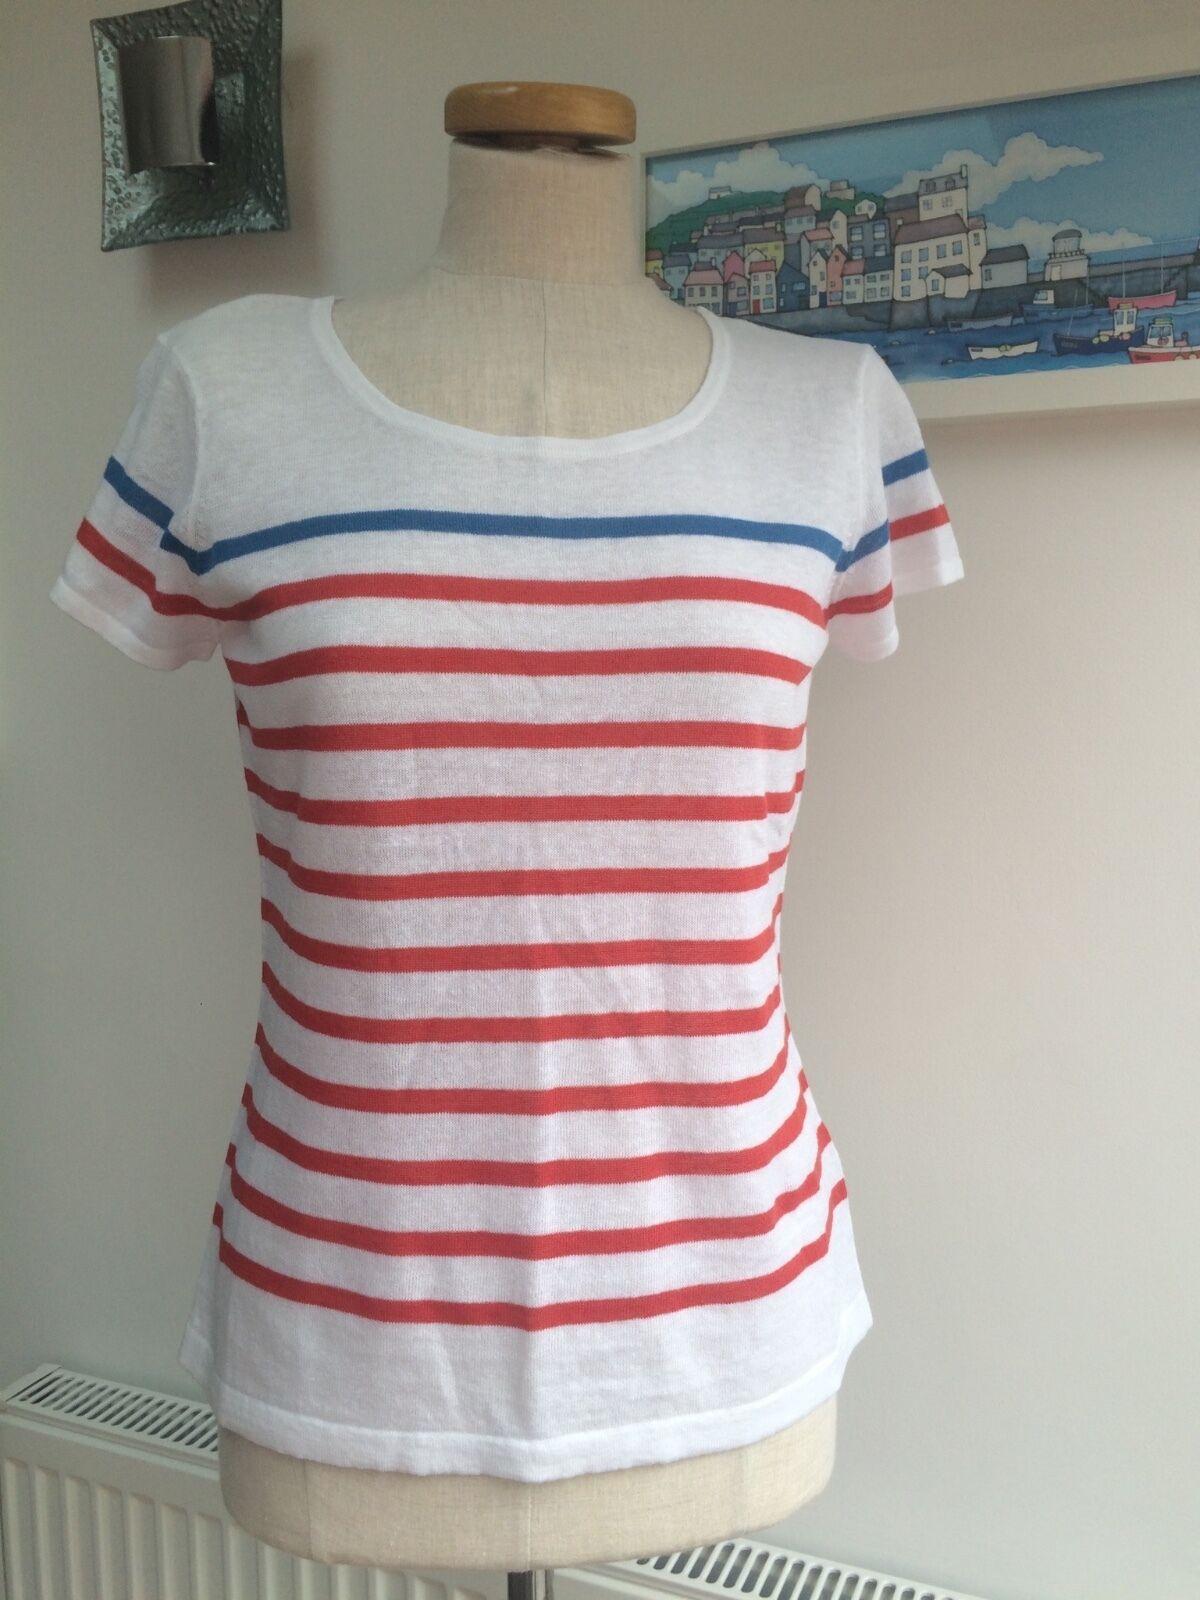 Seasalt Gunwalloe Tee Knit - Menehay Sunstone - UK10 - Sales Sample SAVE